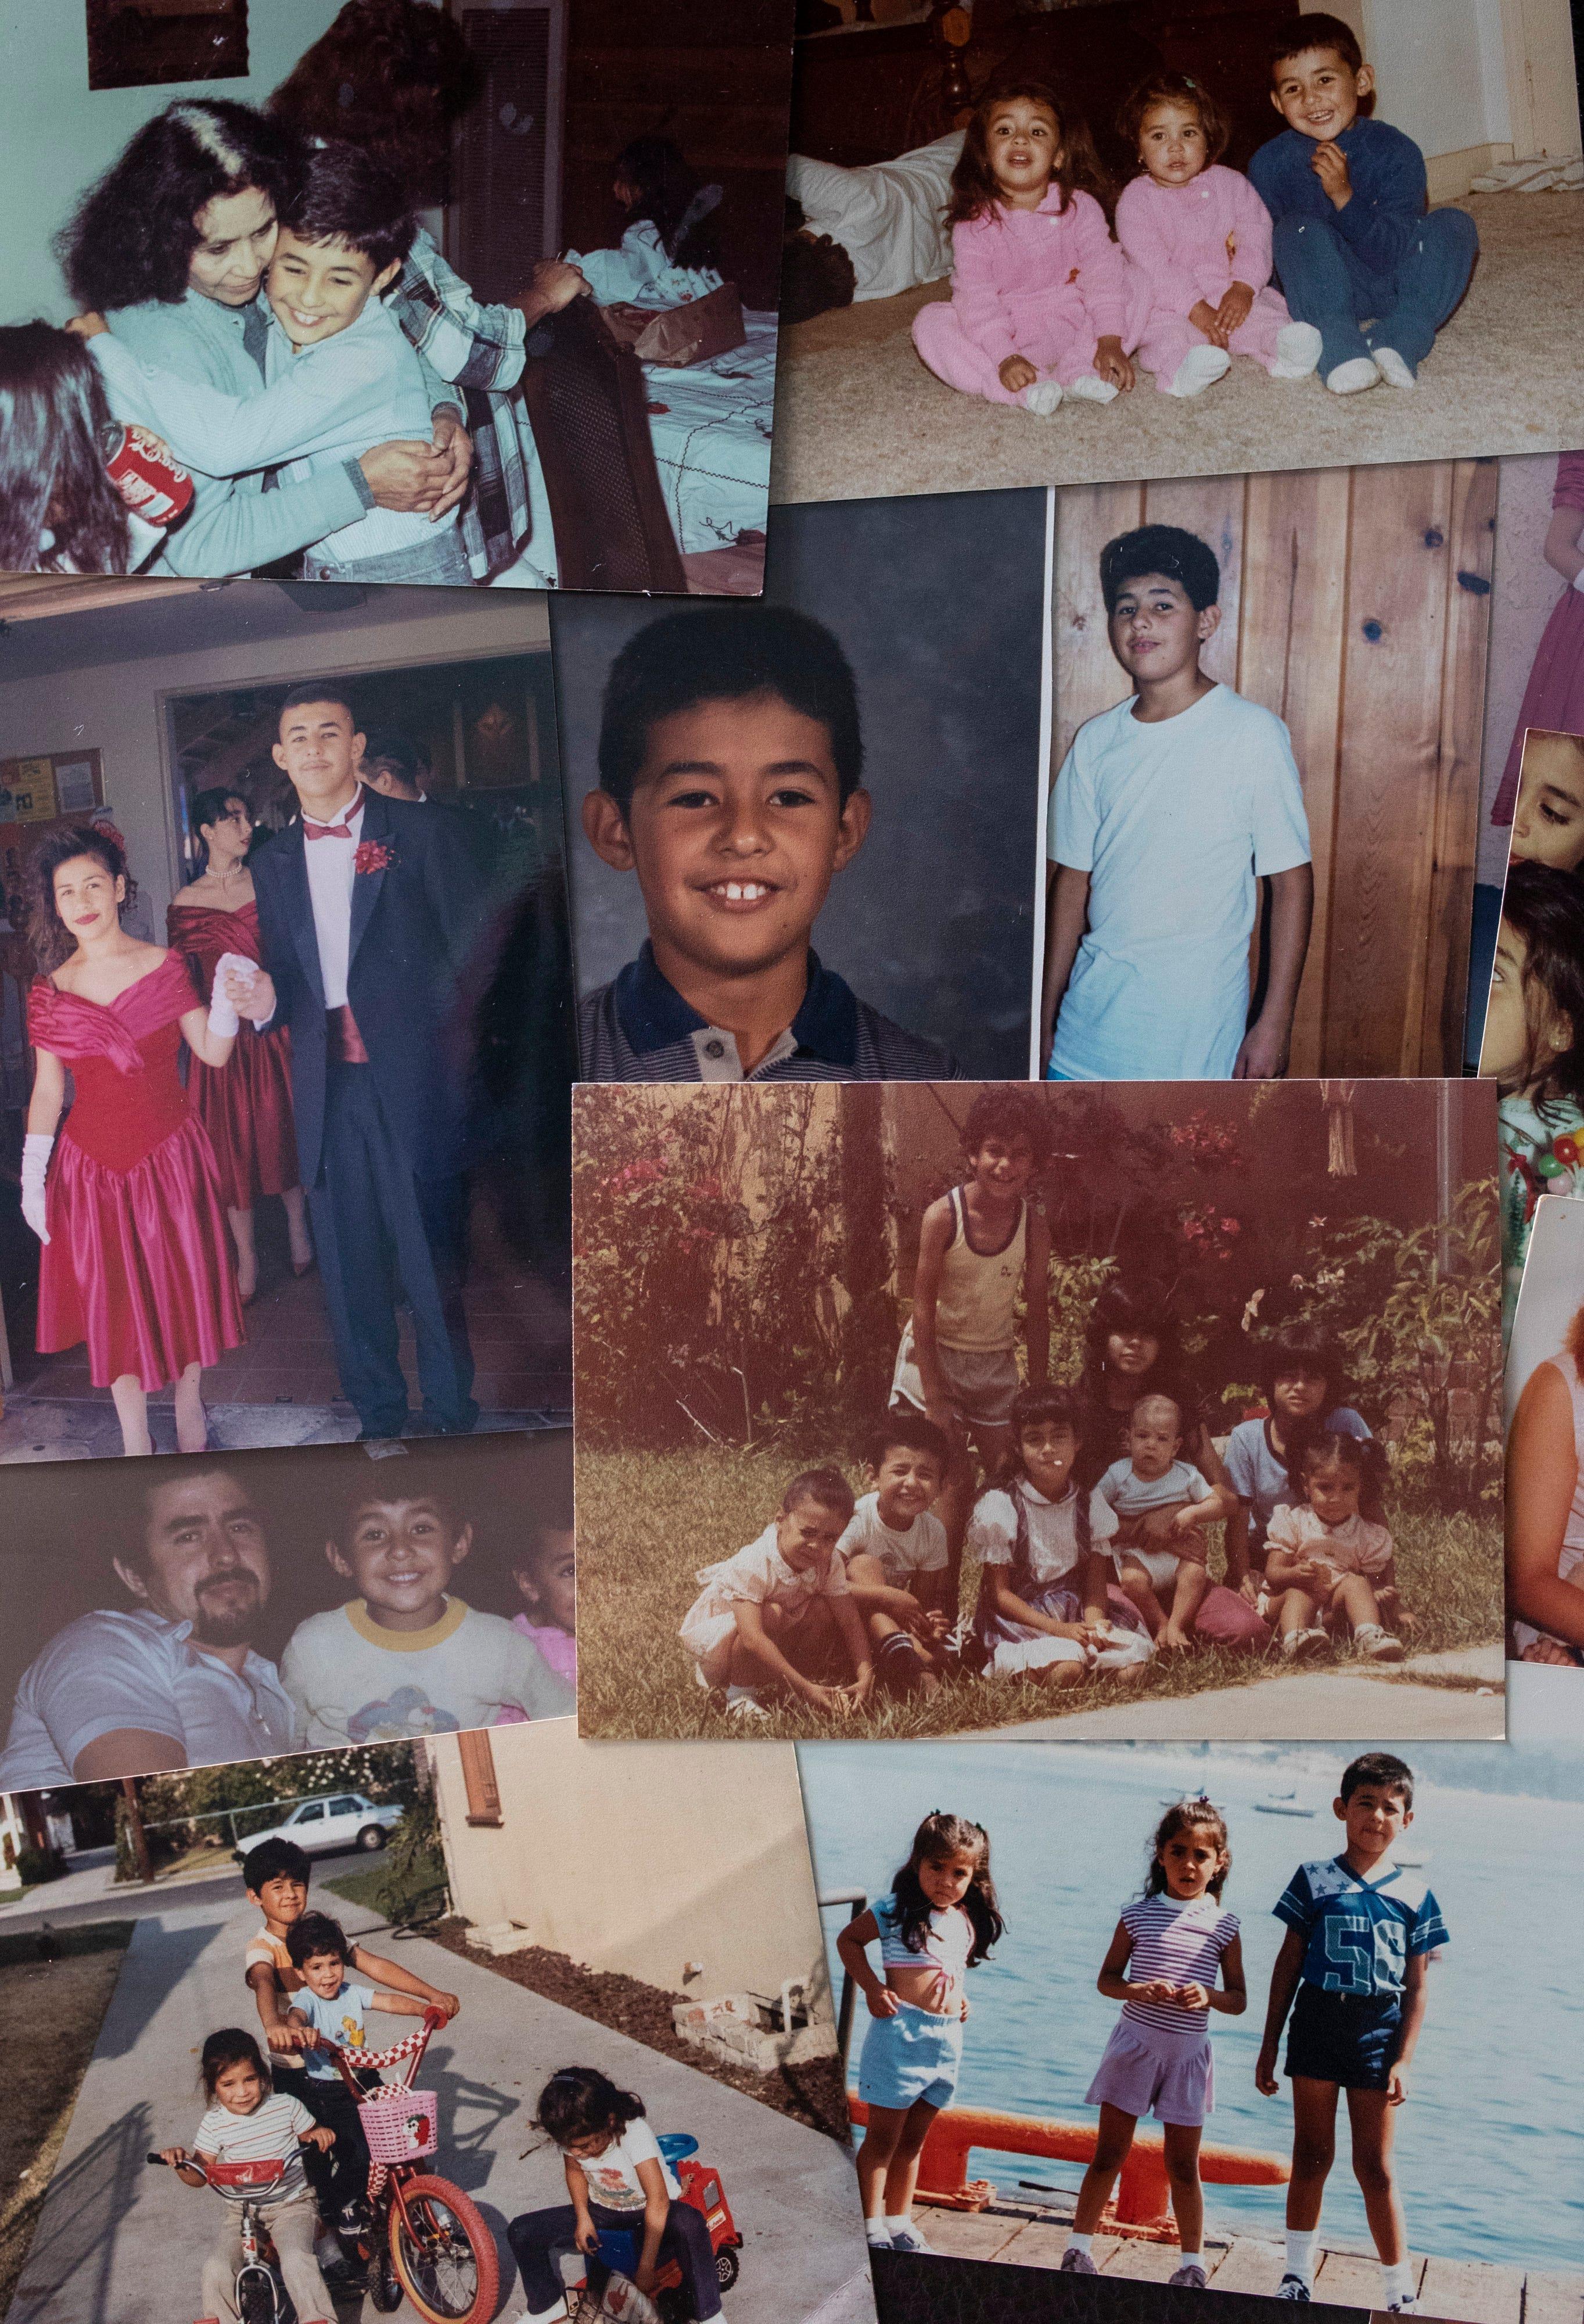 Family photographs of Oscar Macias through the years.